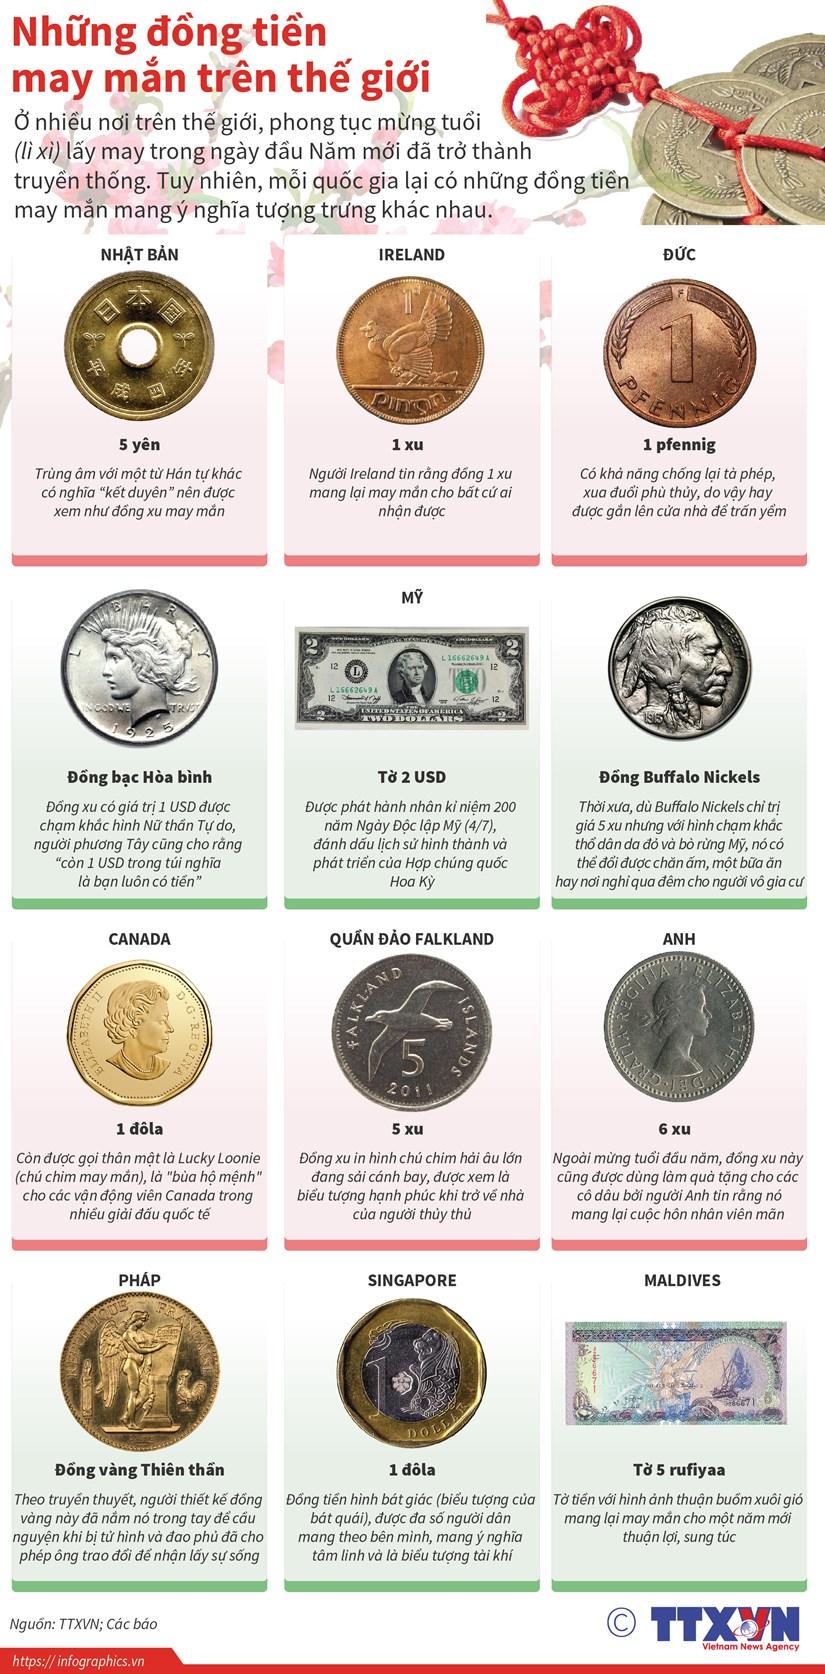 [Infographics] Nhung dong tien may man tren the gioi hinh anh 1